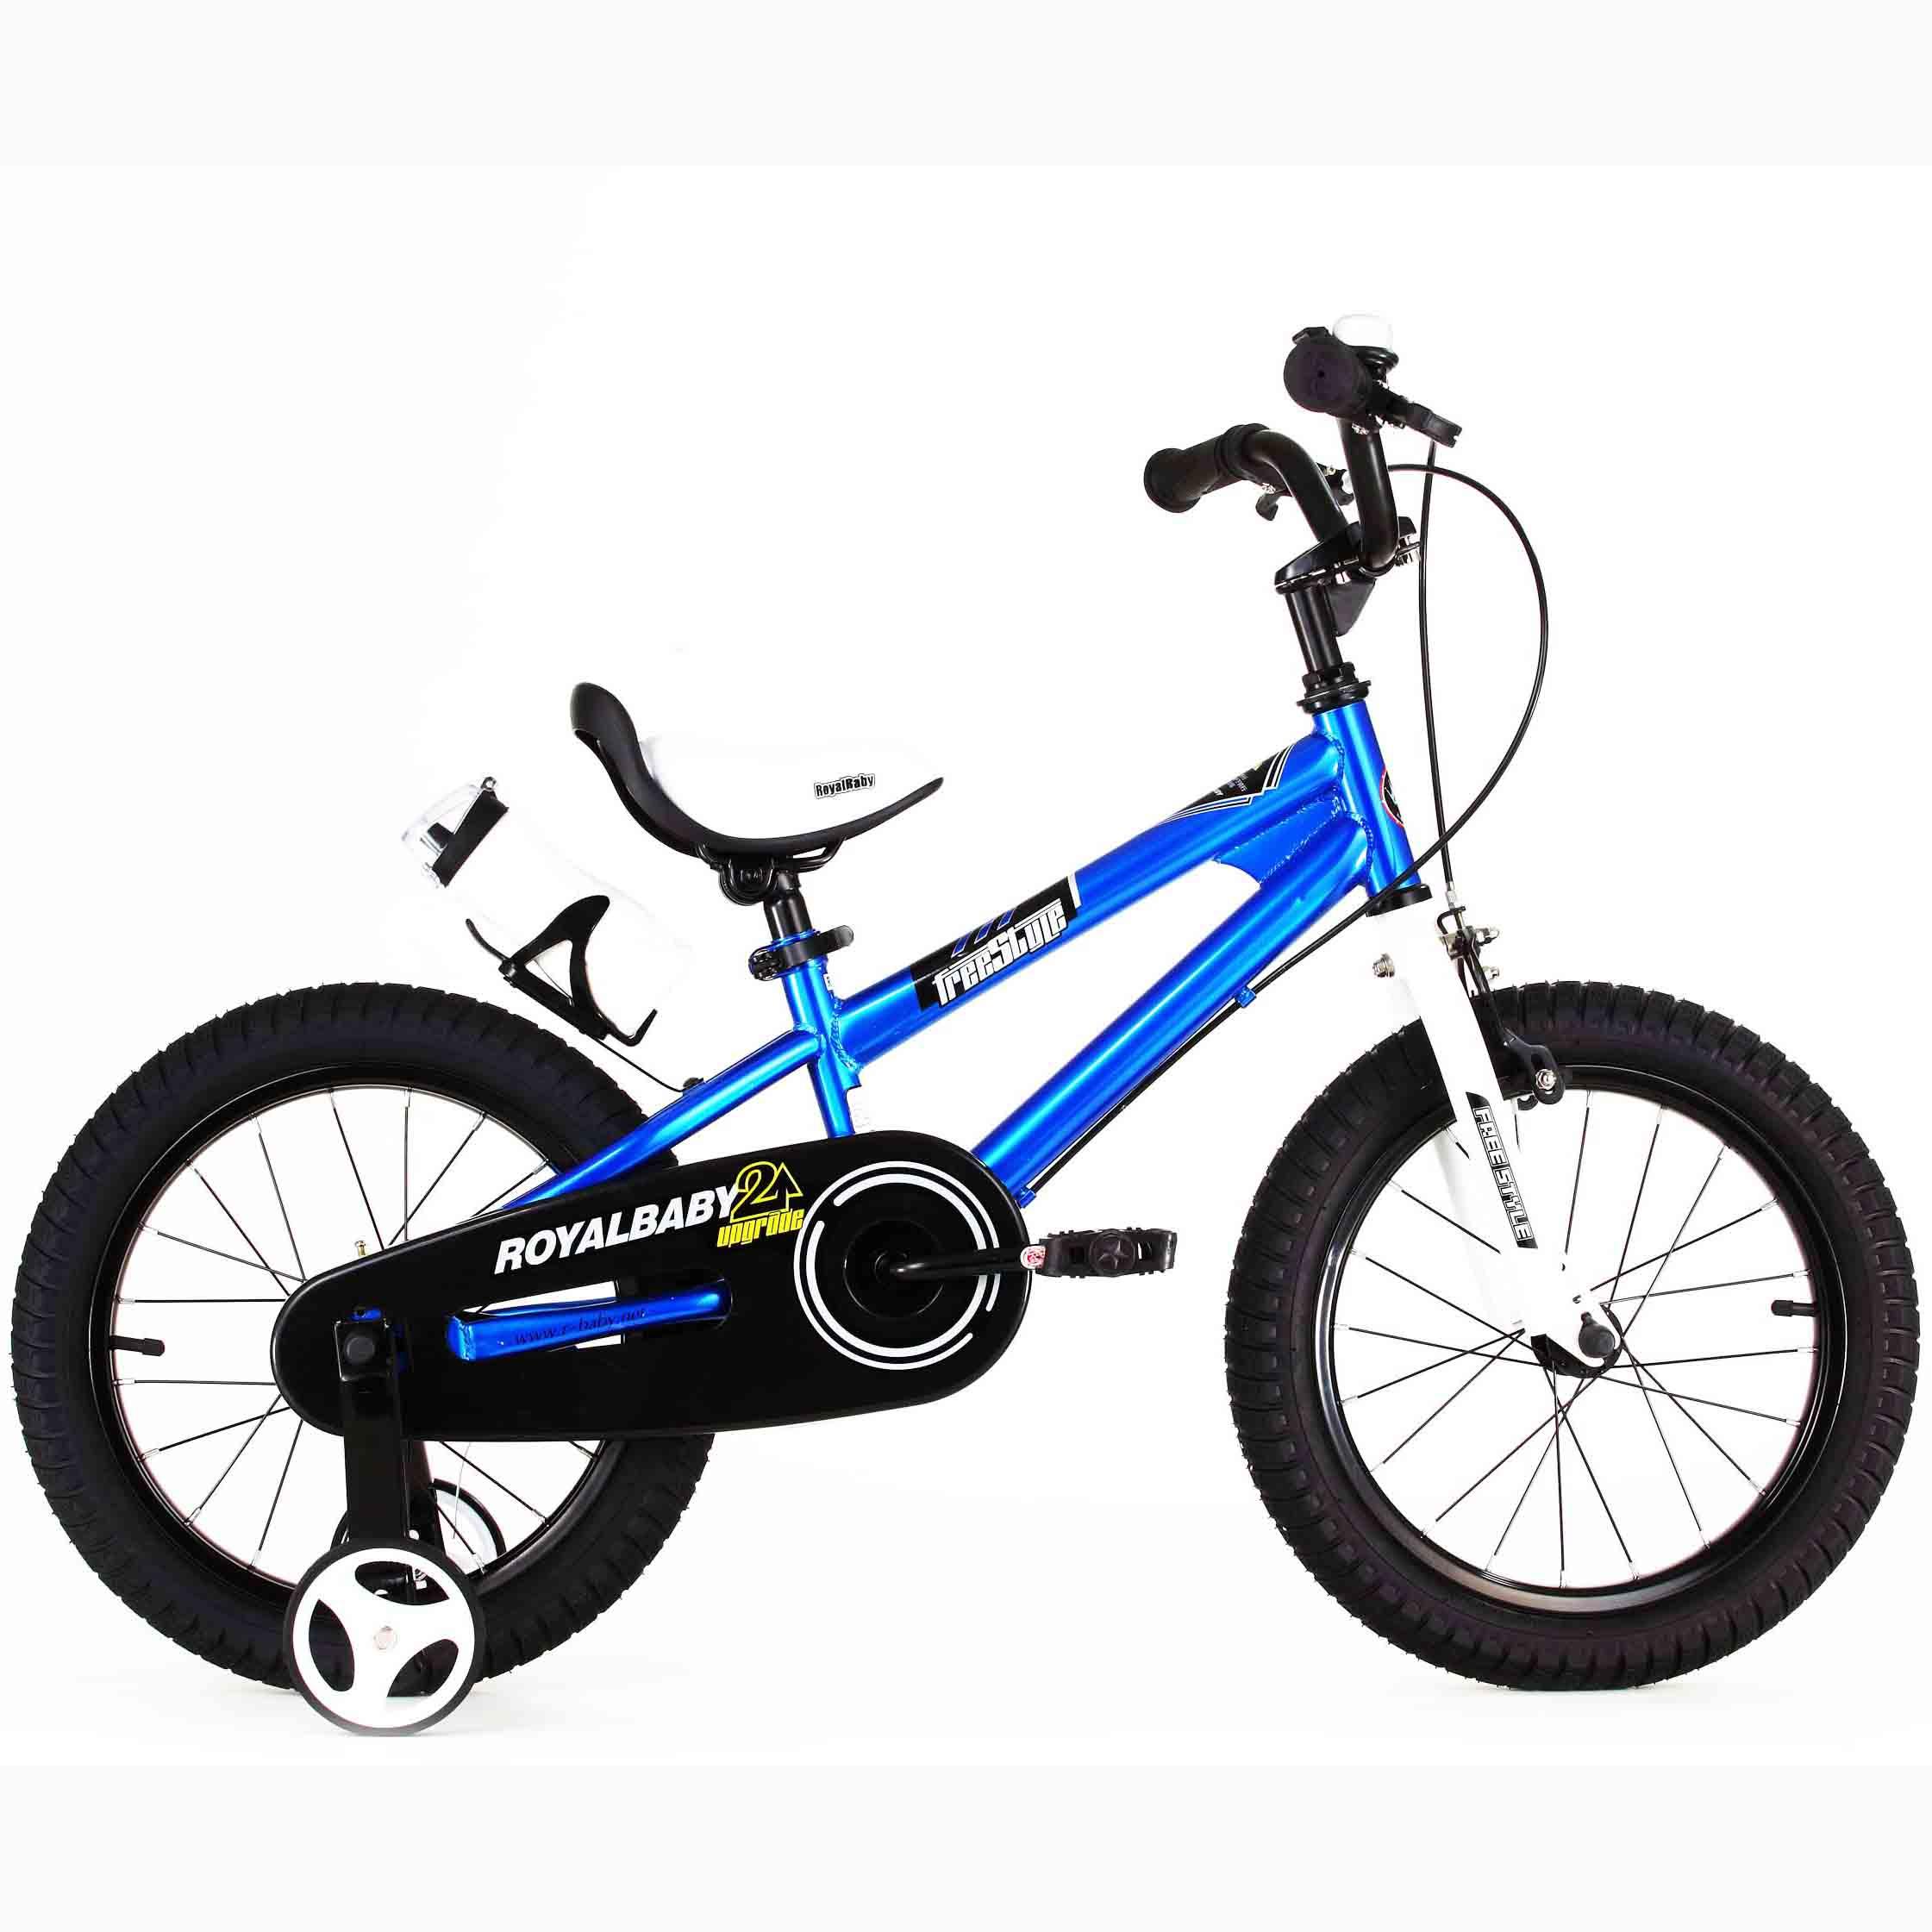 Фото Велосипед RoyalBaby FREESTYLE 18″, синий